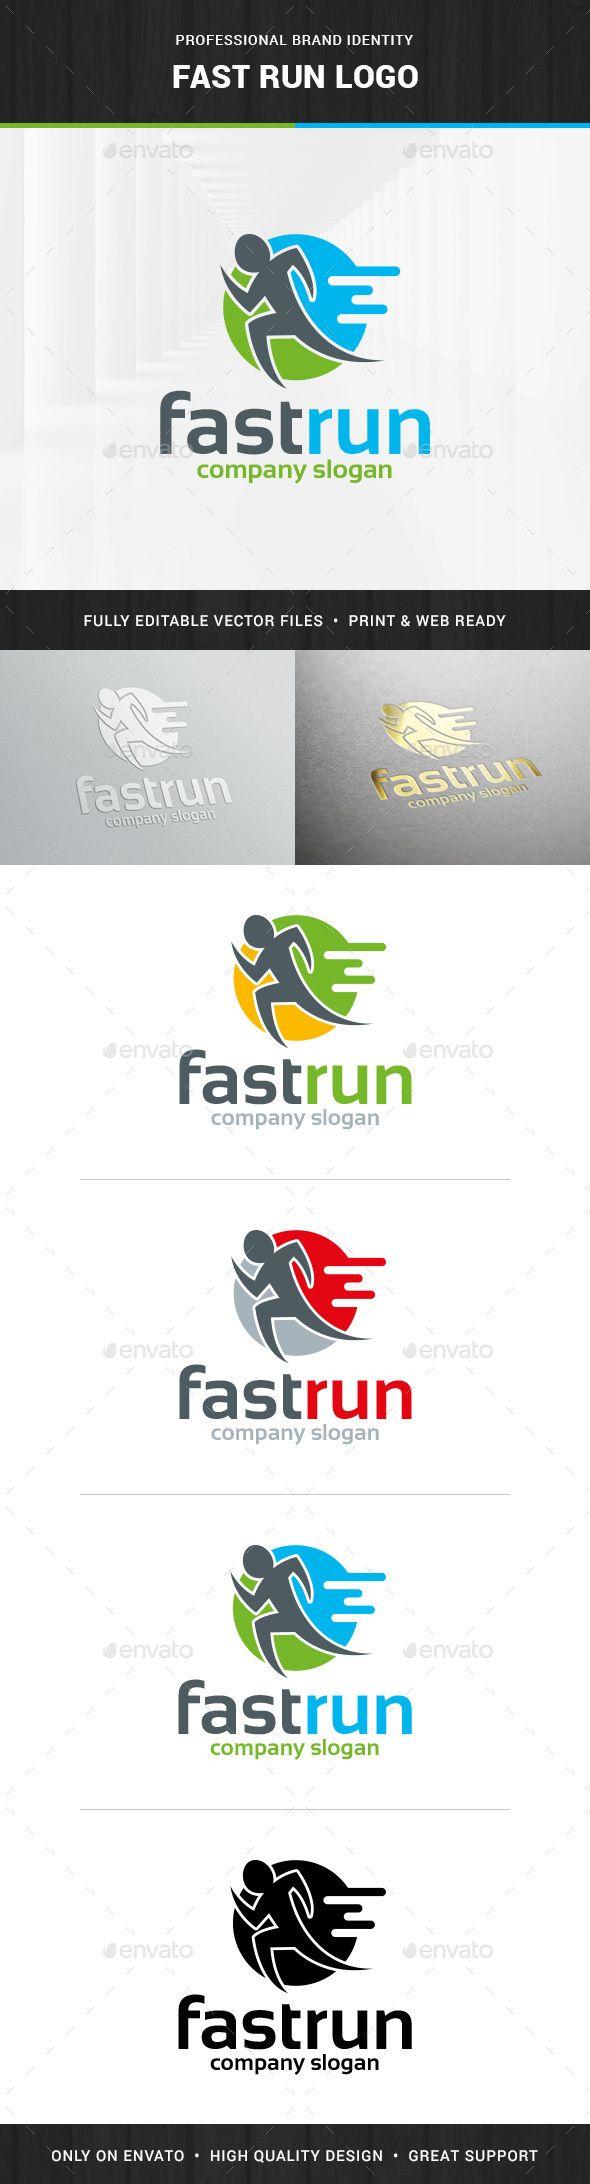 Fast Run Logo Template